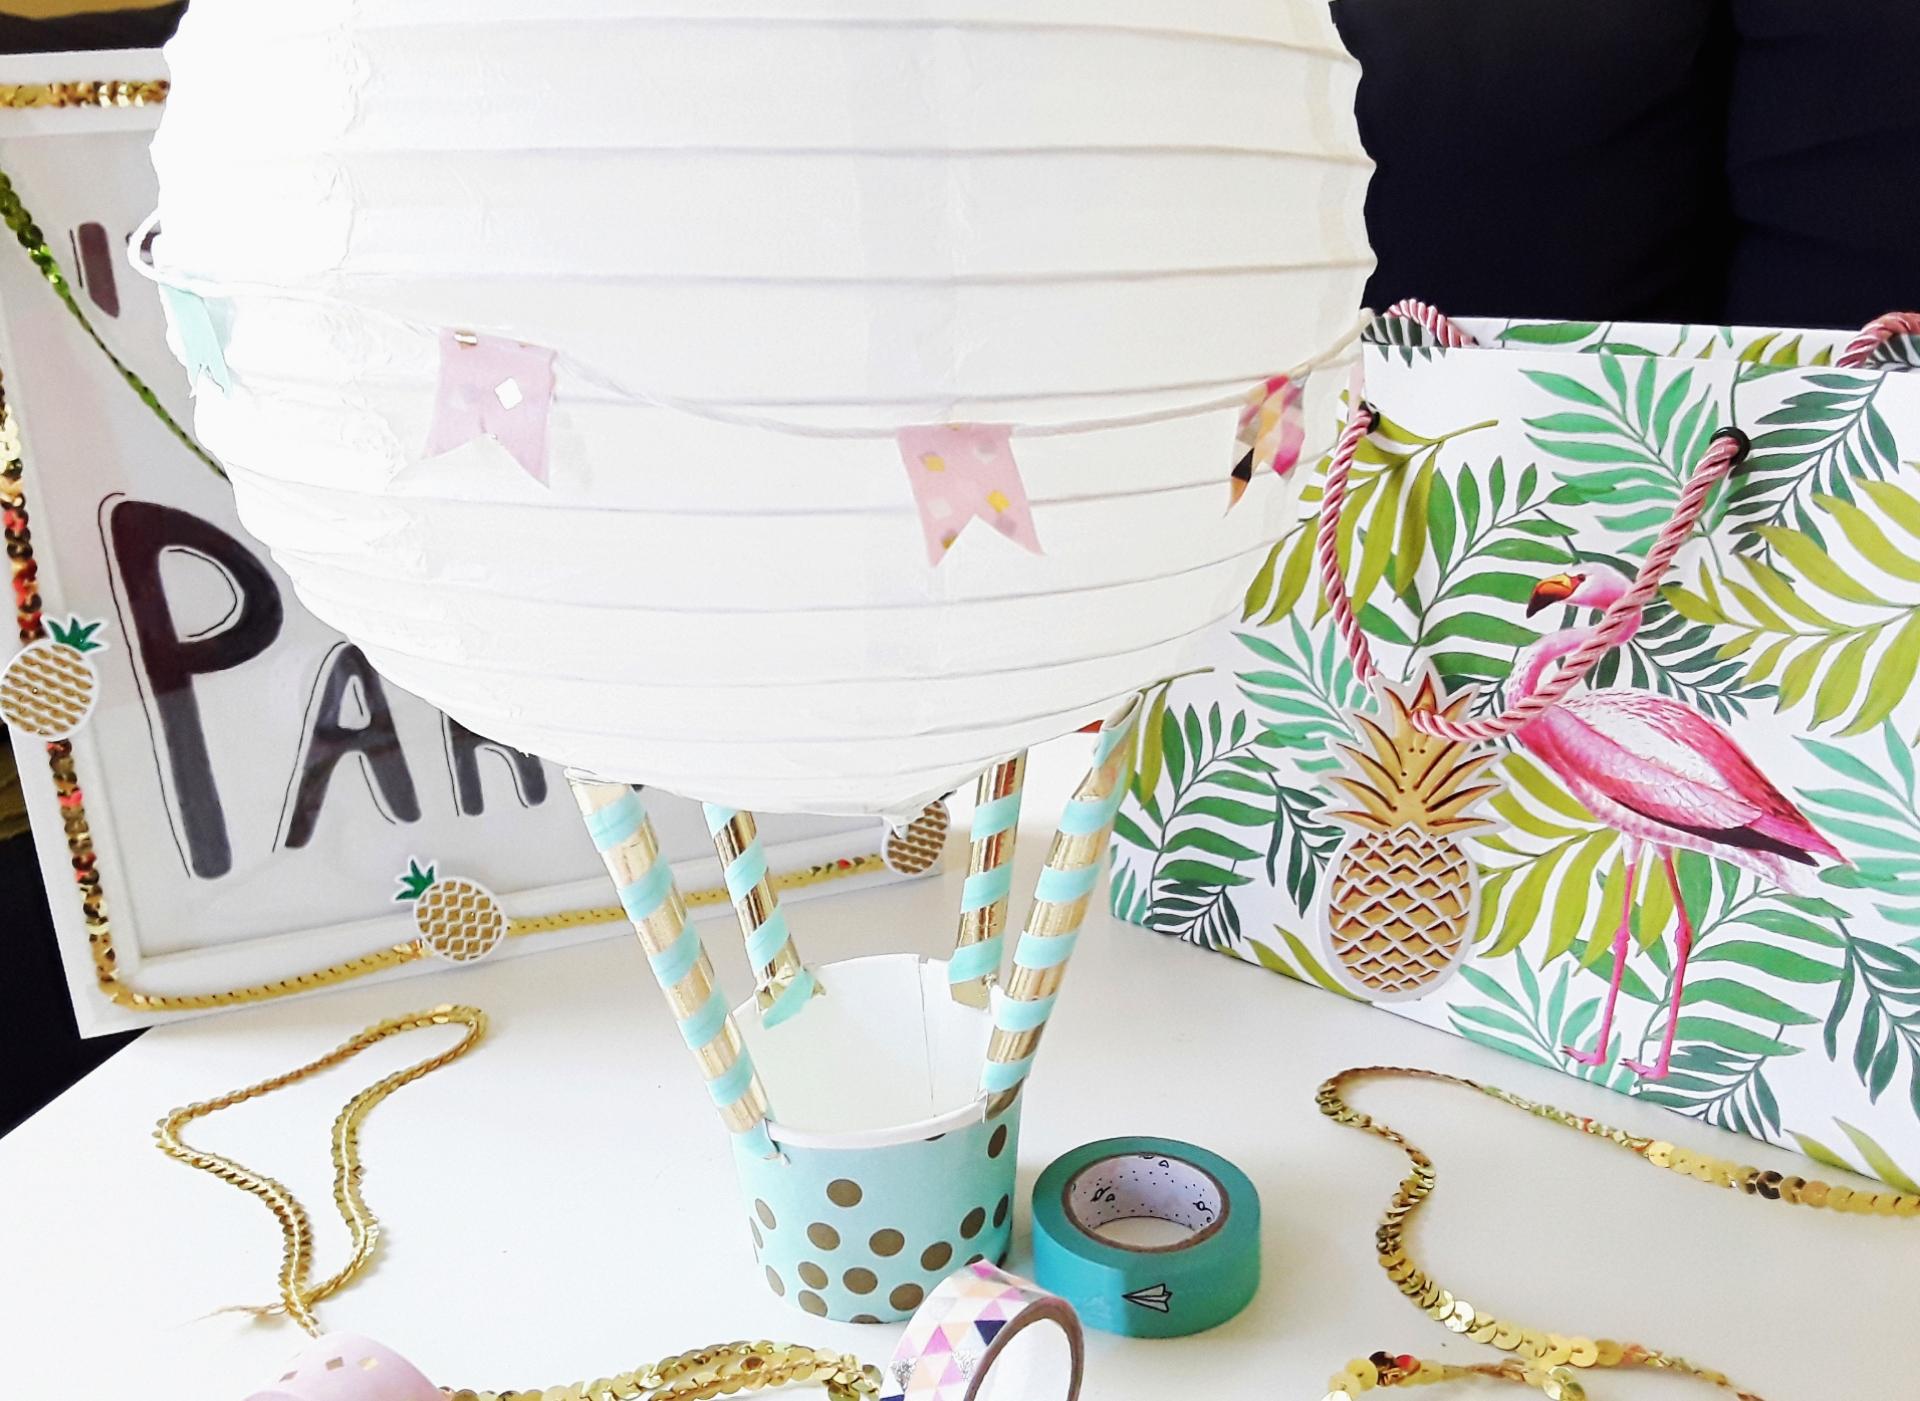 Papier Heissluftballon Als Geschenkverpackung Madebylothis Kreativblog